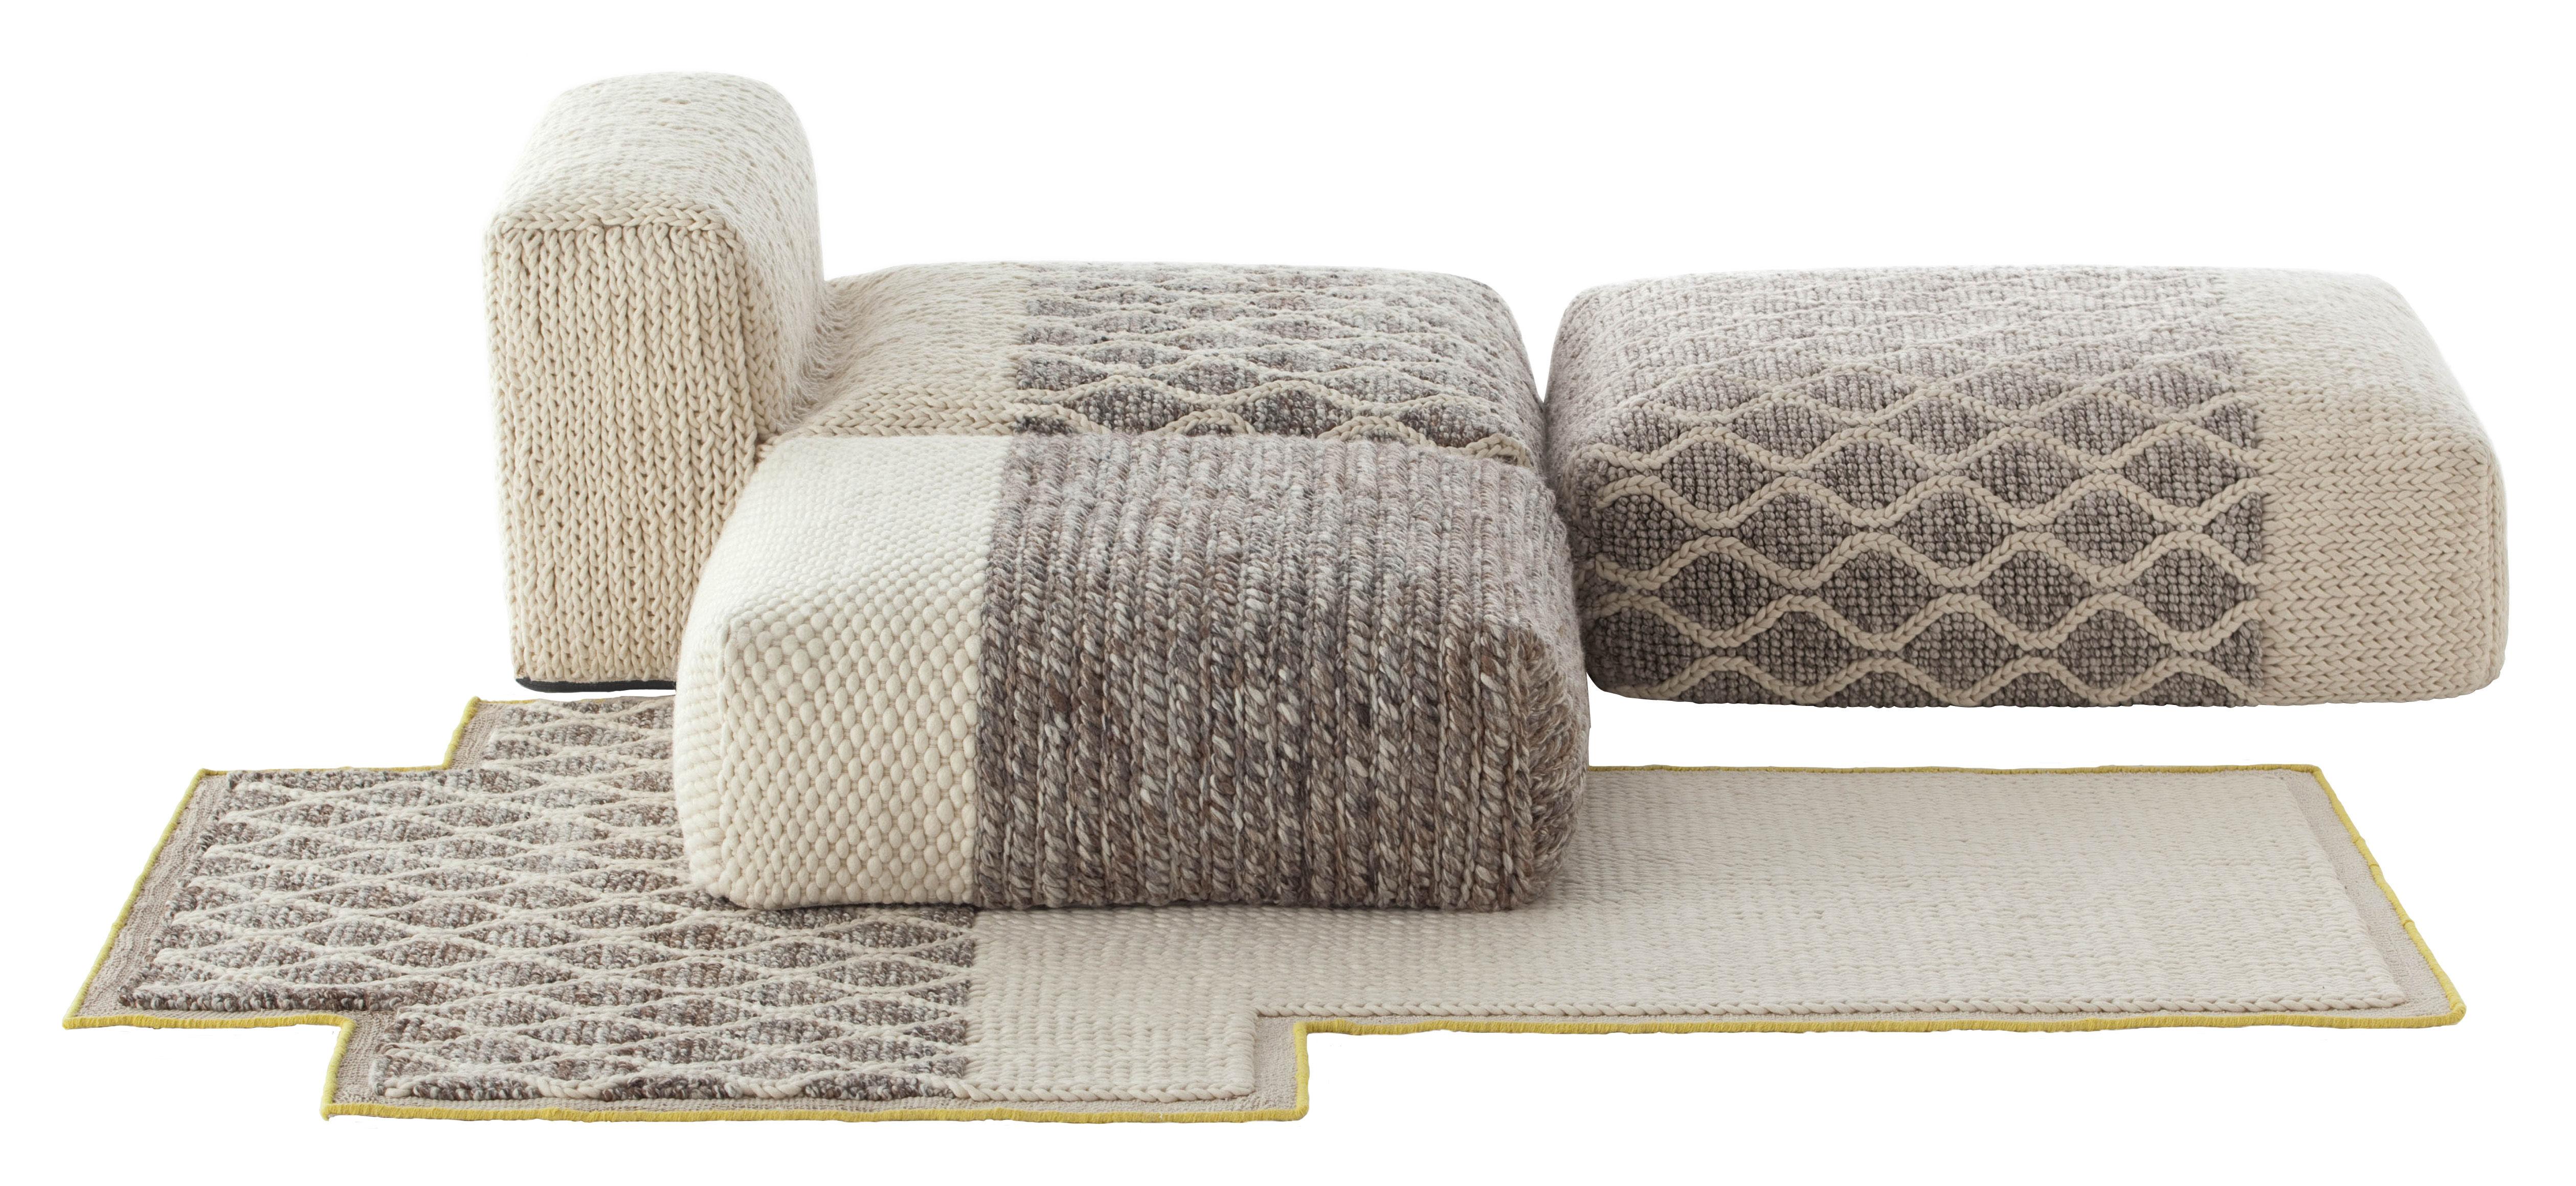 Arredamento - Poltrone design  - Divano modulabile n°2 Mangas Space - / 1 Poltrona + 2 pouf + 1 tappeto di Gan - Avorio - Laine vierge, Mousse caoutchouc